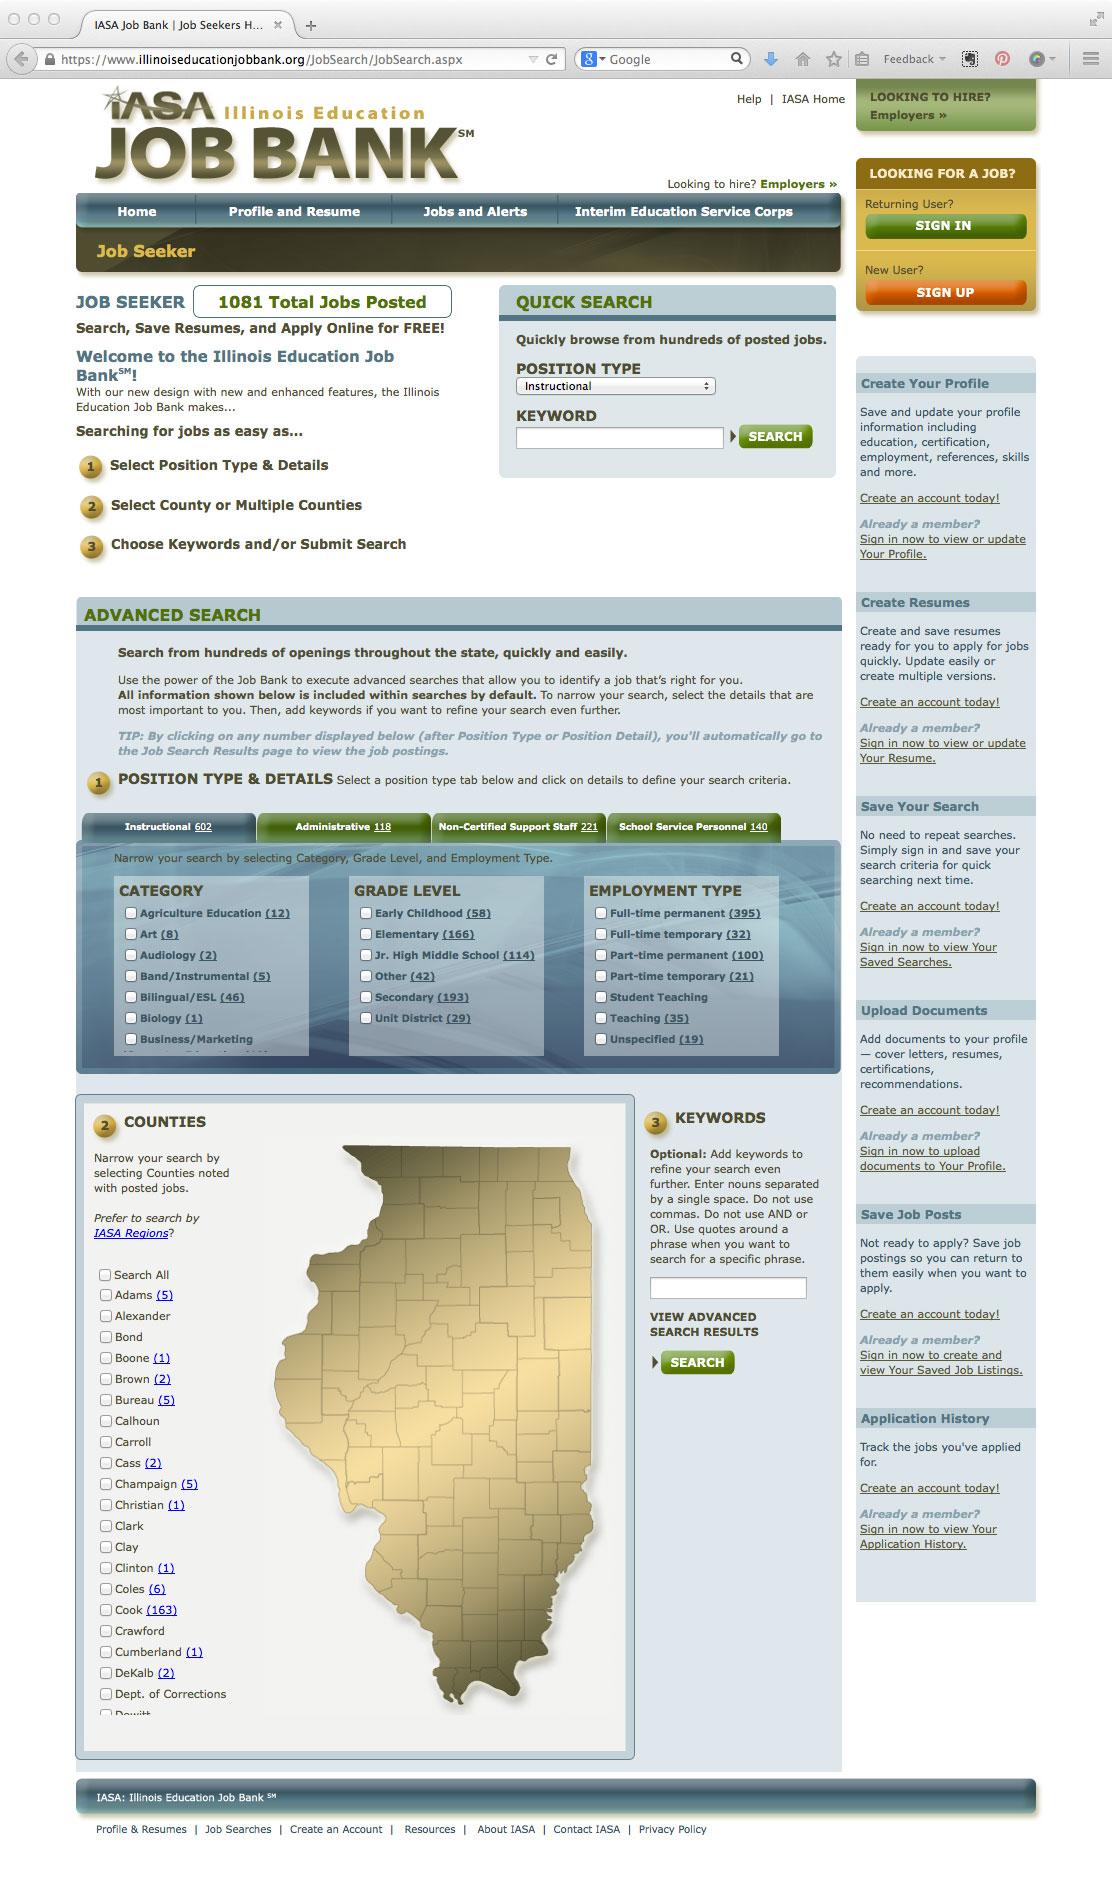 Illinois Education Job Bank